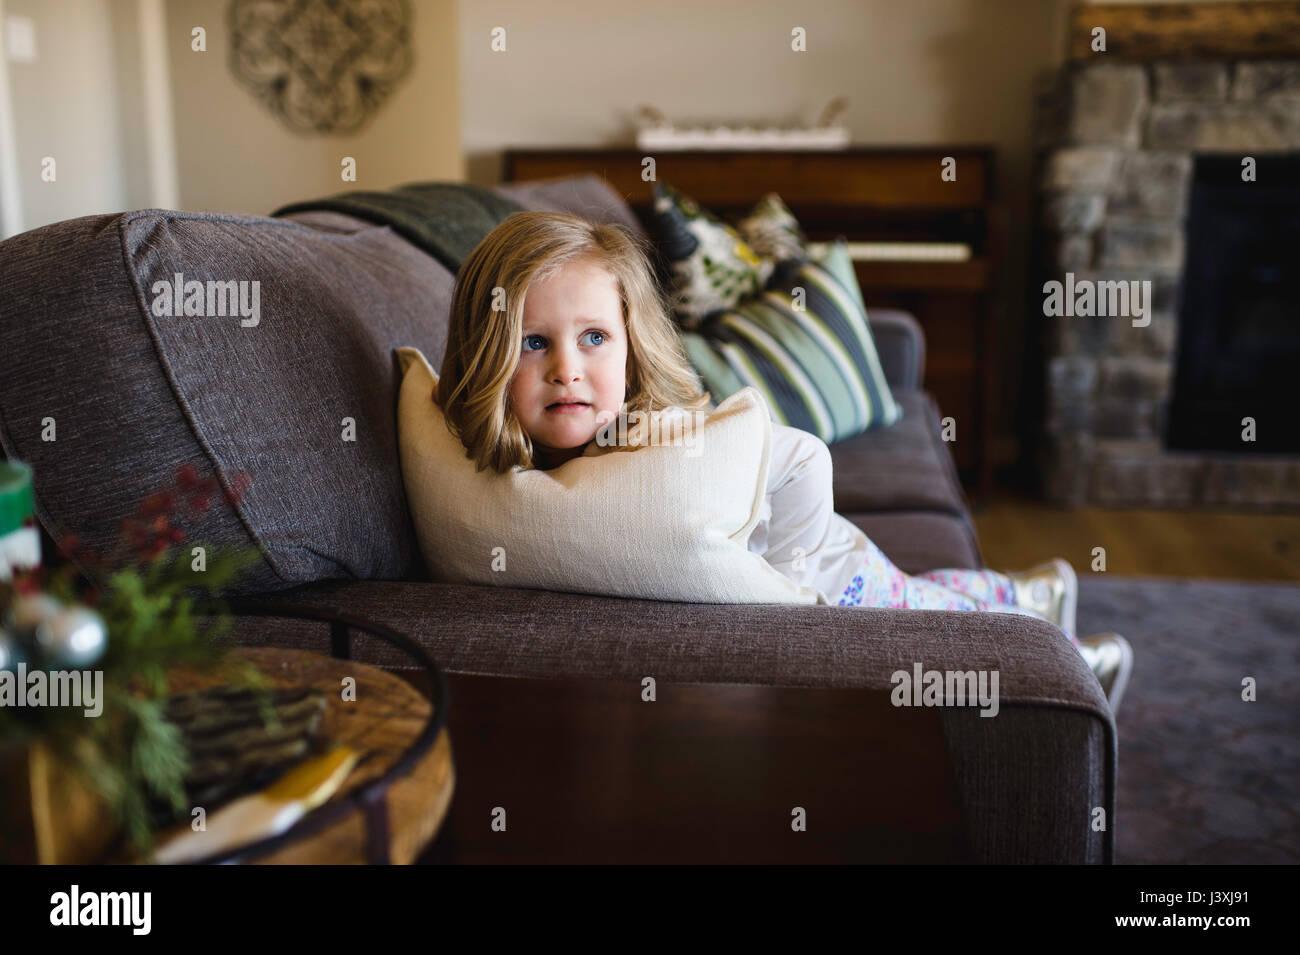 Temerosos girl looking sideways de SOFA Foto de stock